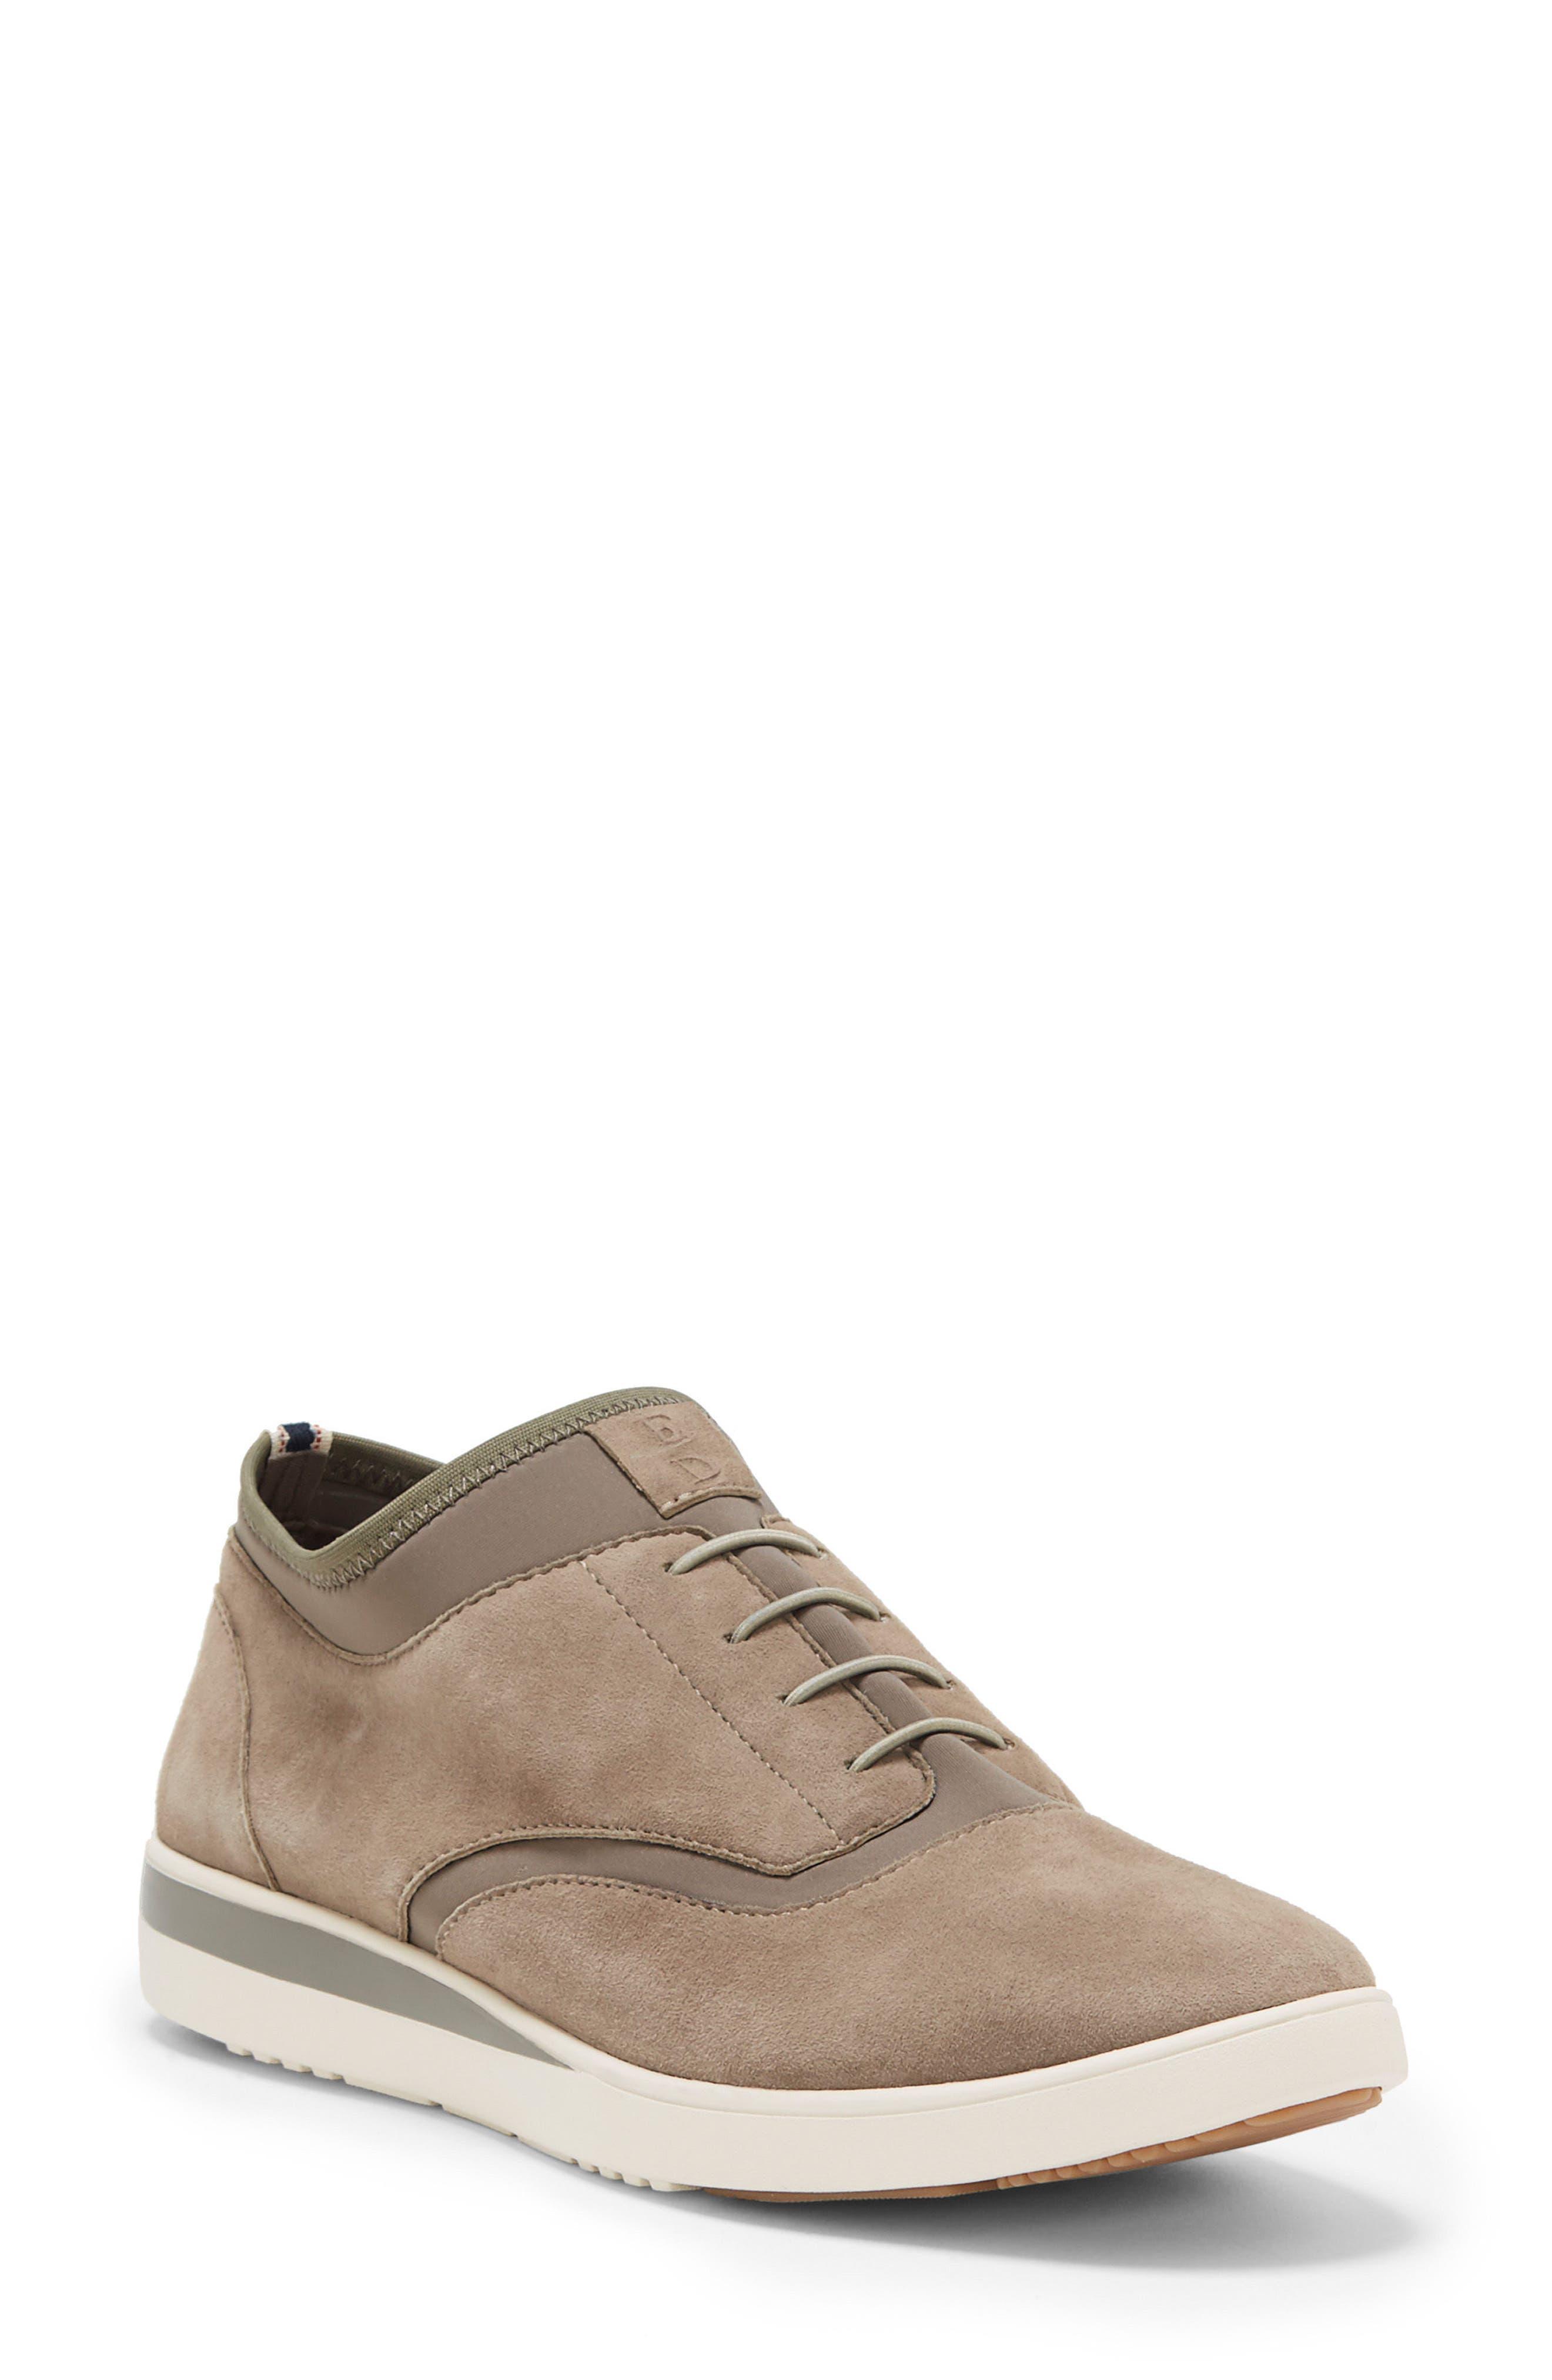 Atala Sneaker,                         Main,                         color, Stone Suede